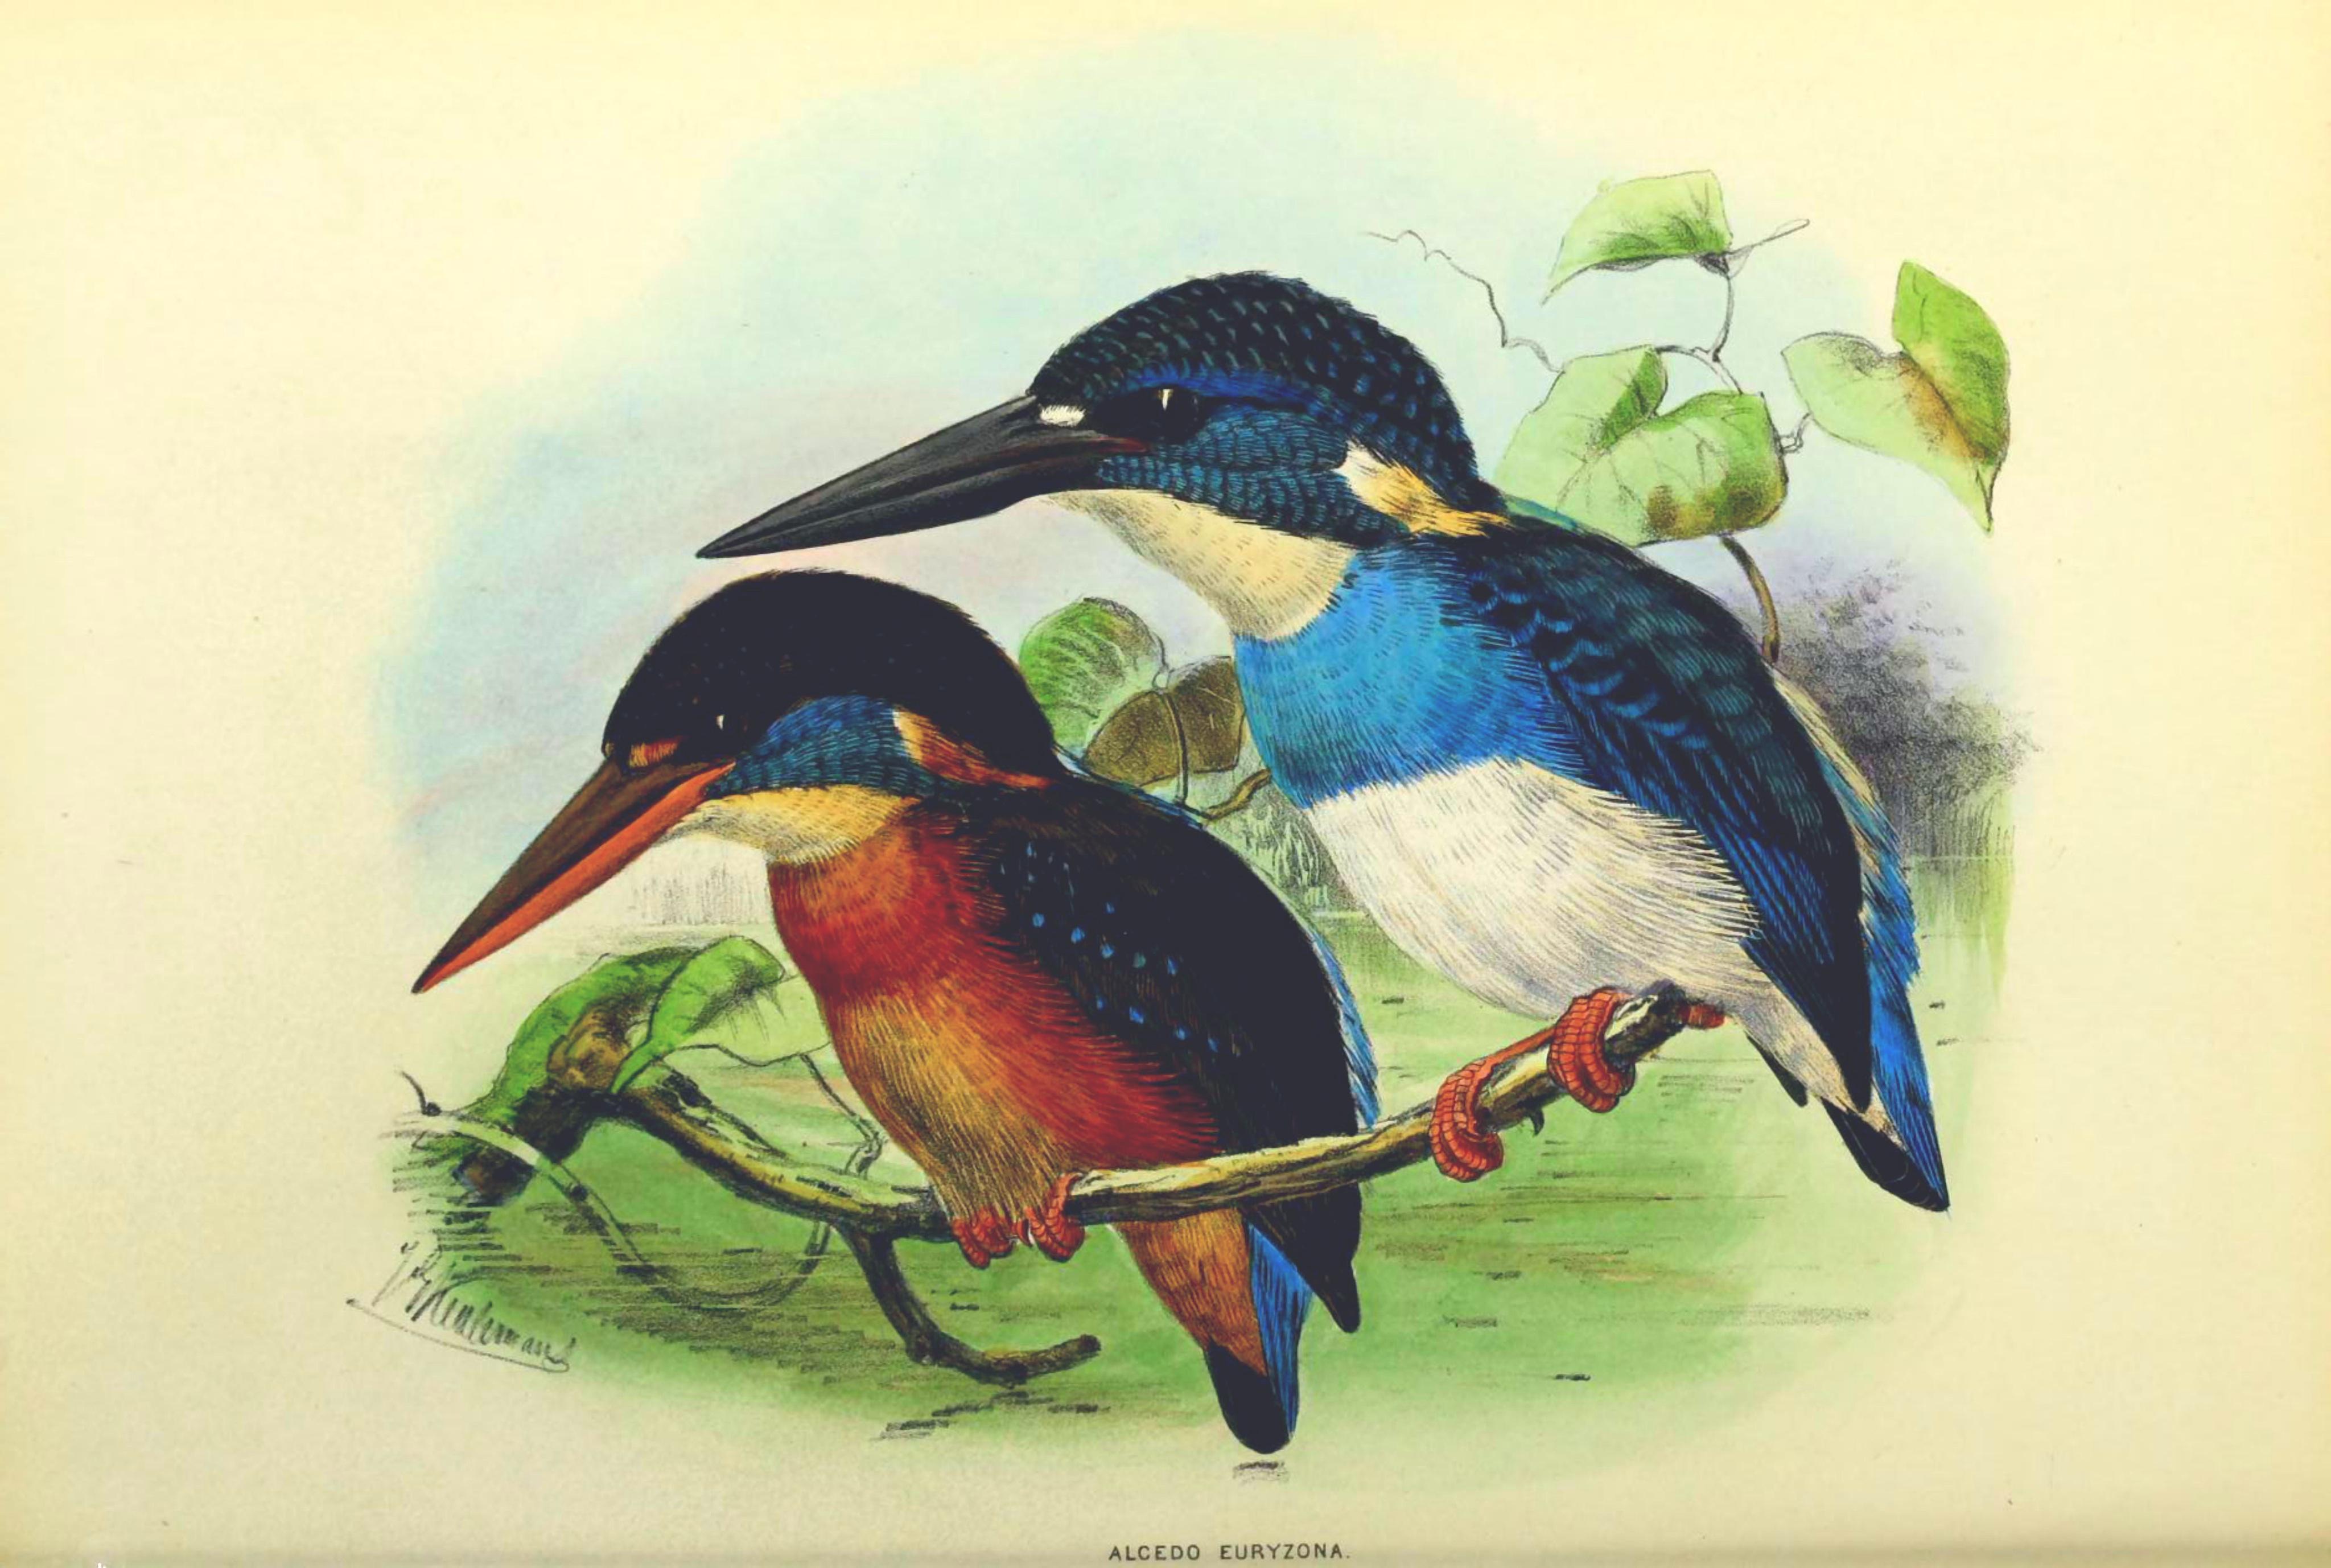 Burung Pekakak Jawa alias Kingfisher alias Alcedo euryzona.